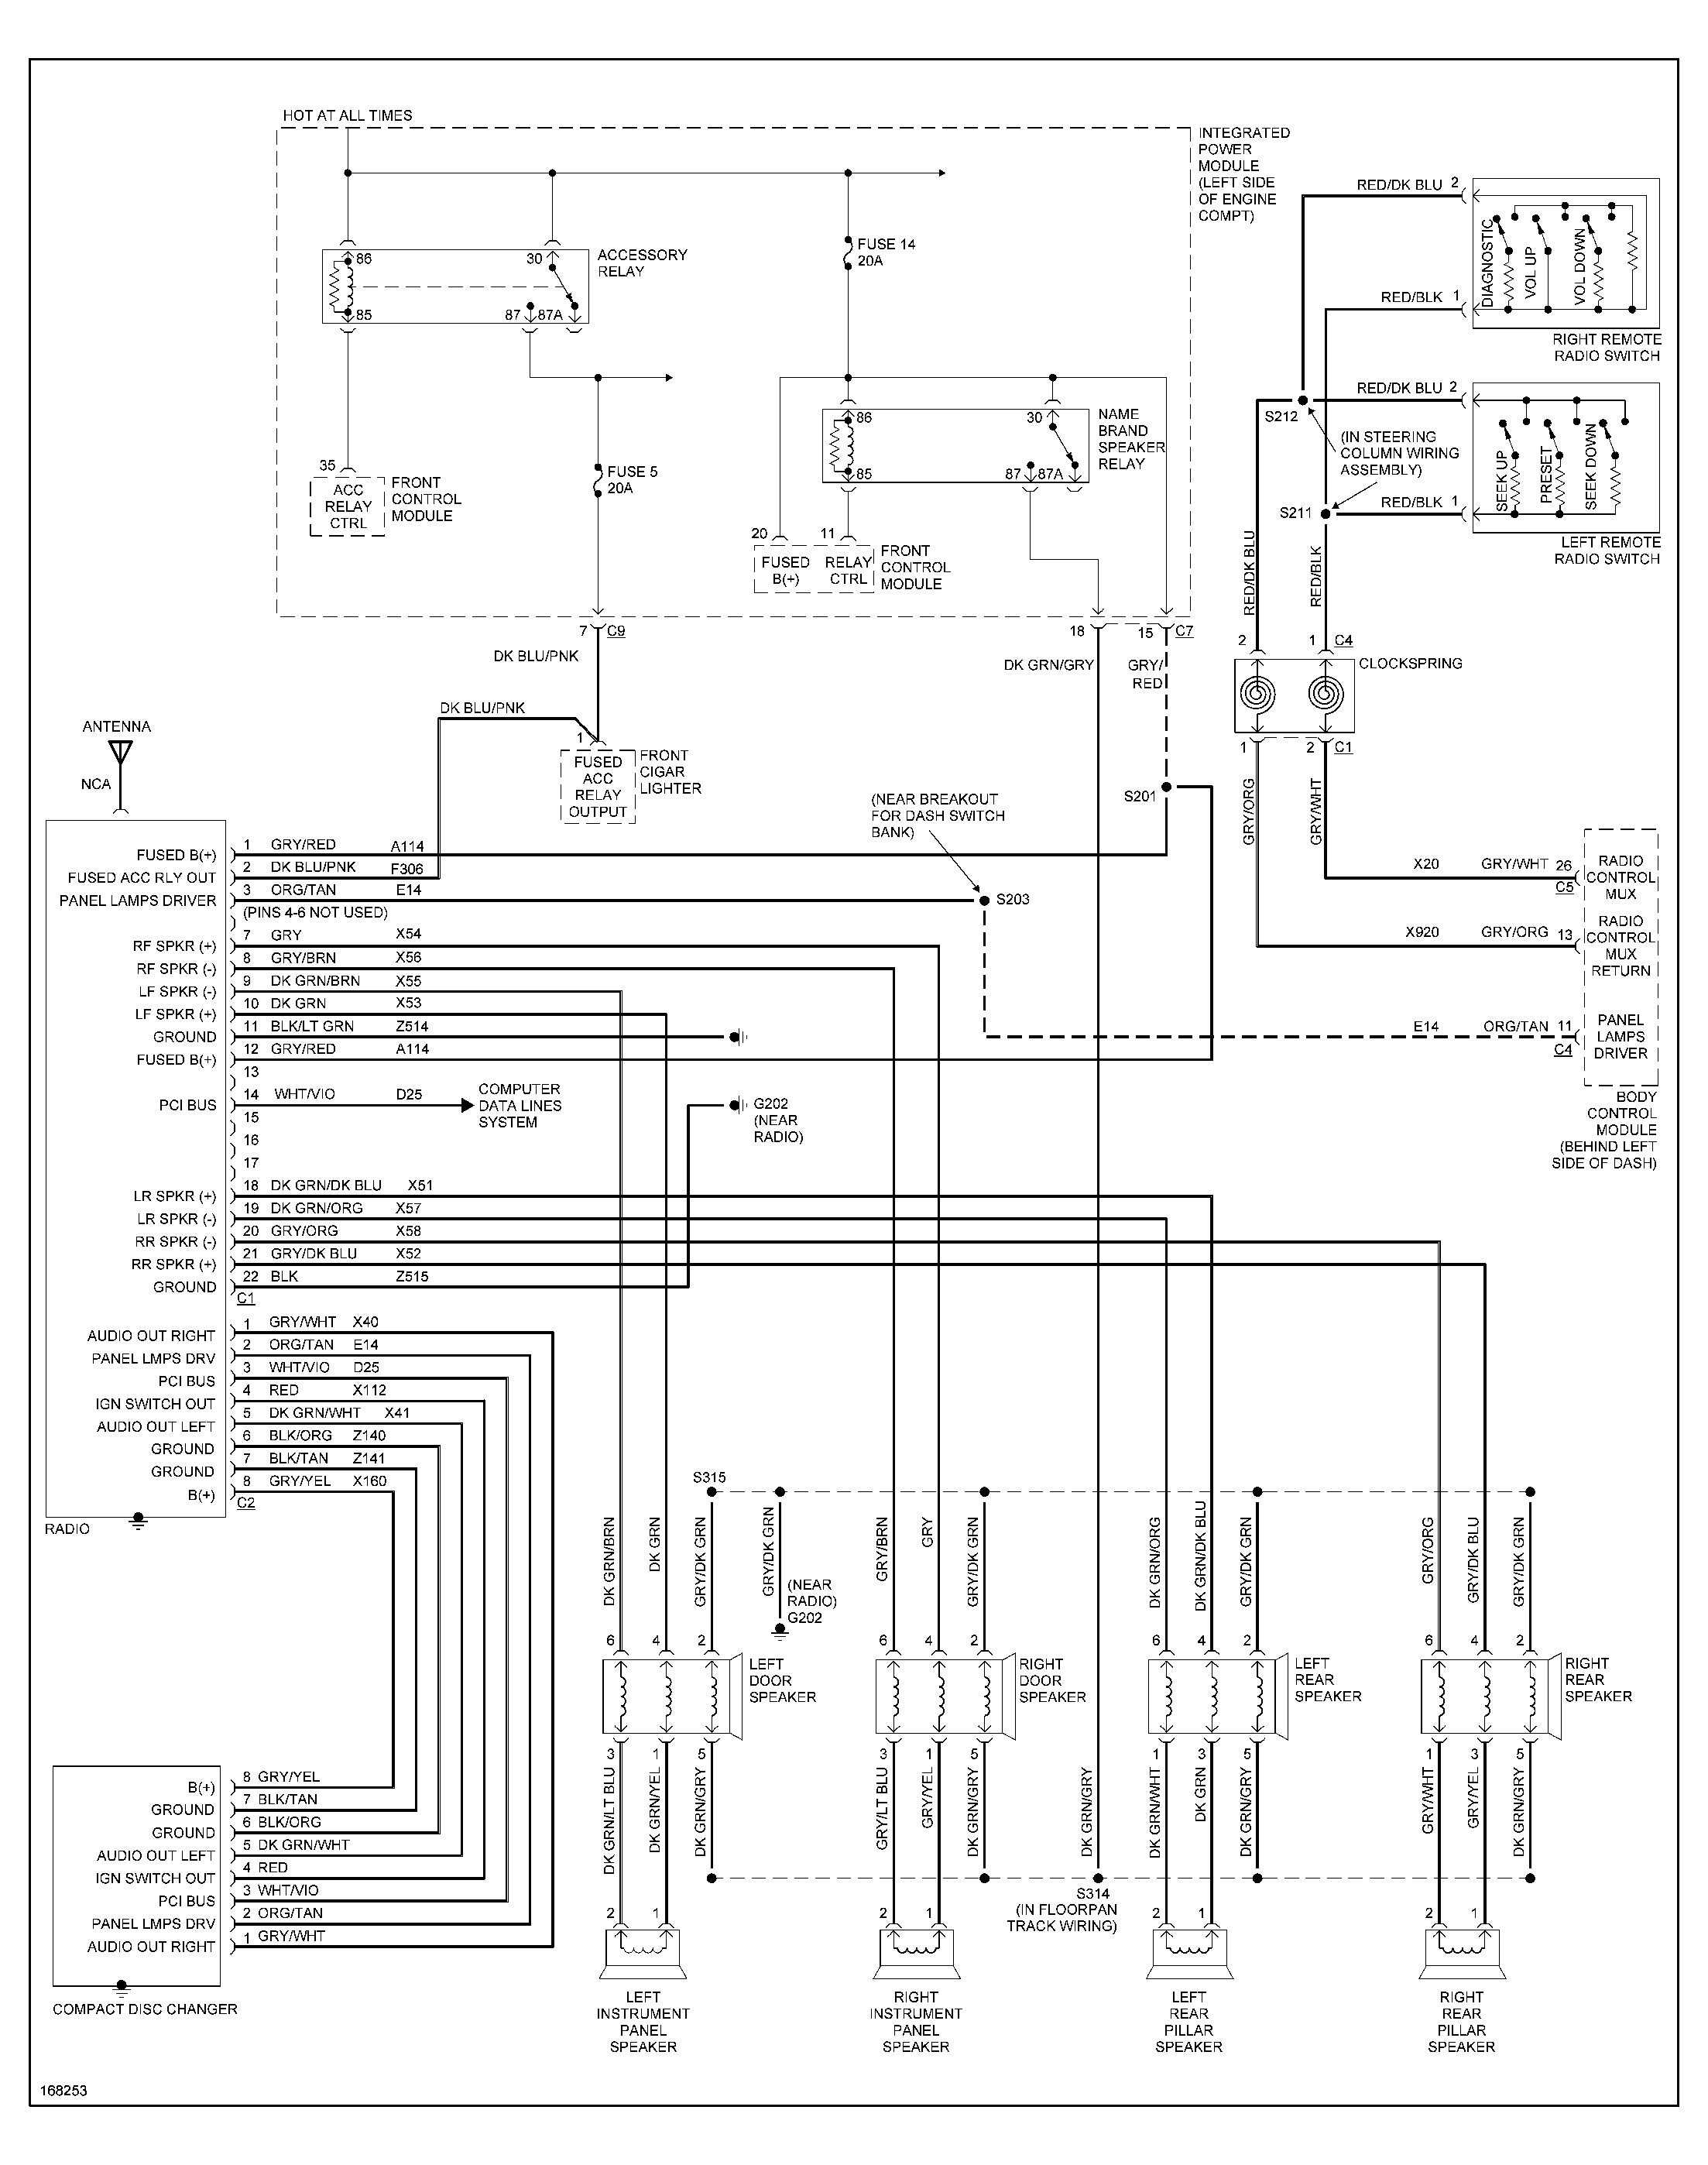 [SODI_2457]   02 Grand Caravan Wiring Diagram 1970 Mustang Ignition Wiring Diagram -  arga-makmur.art-33.autoprestige-utilitaire.fr | 2007 Dodge Grand Caravan Wiring Diagrams |  | Wiring Diagram and Schematics